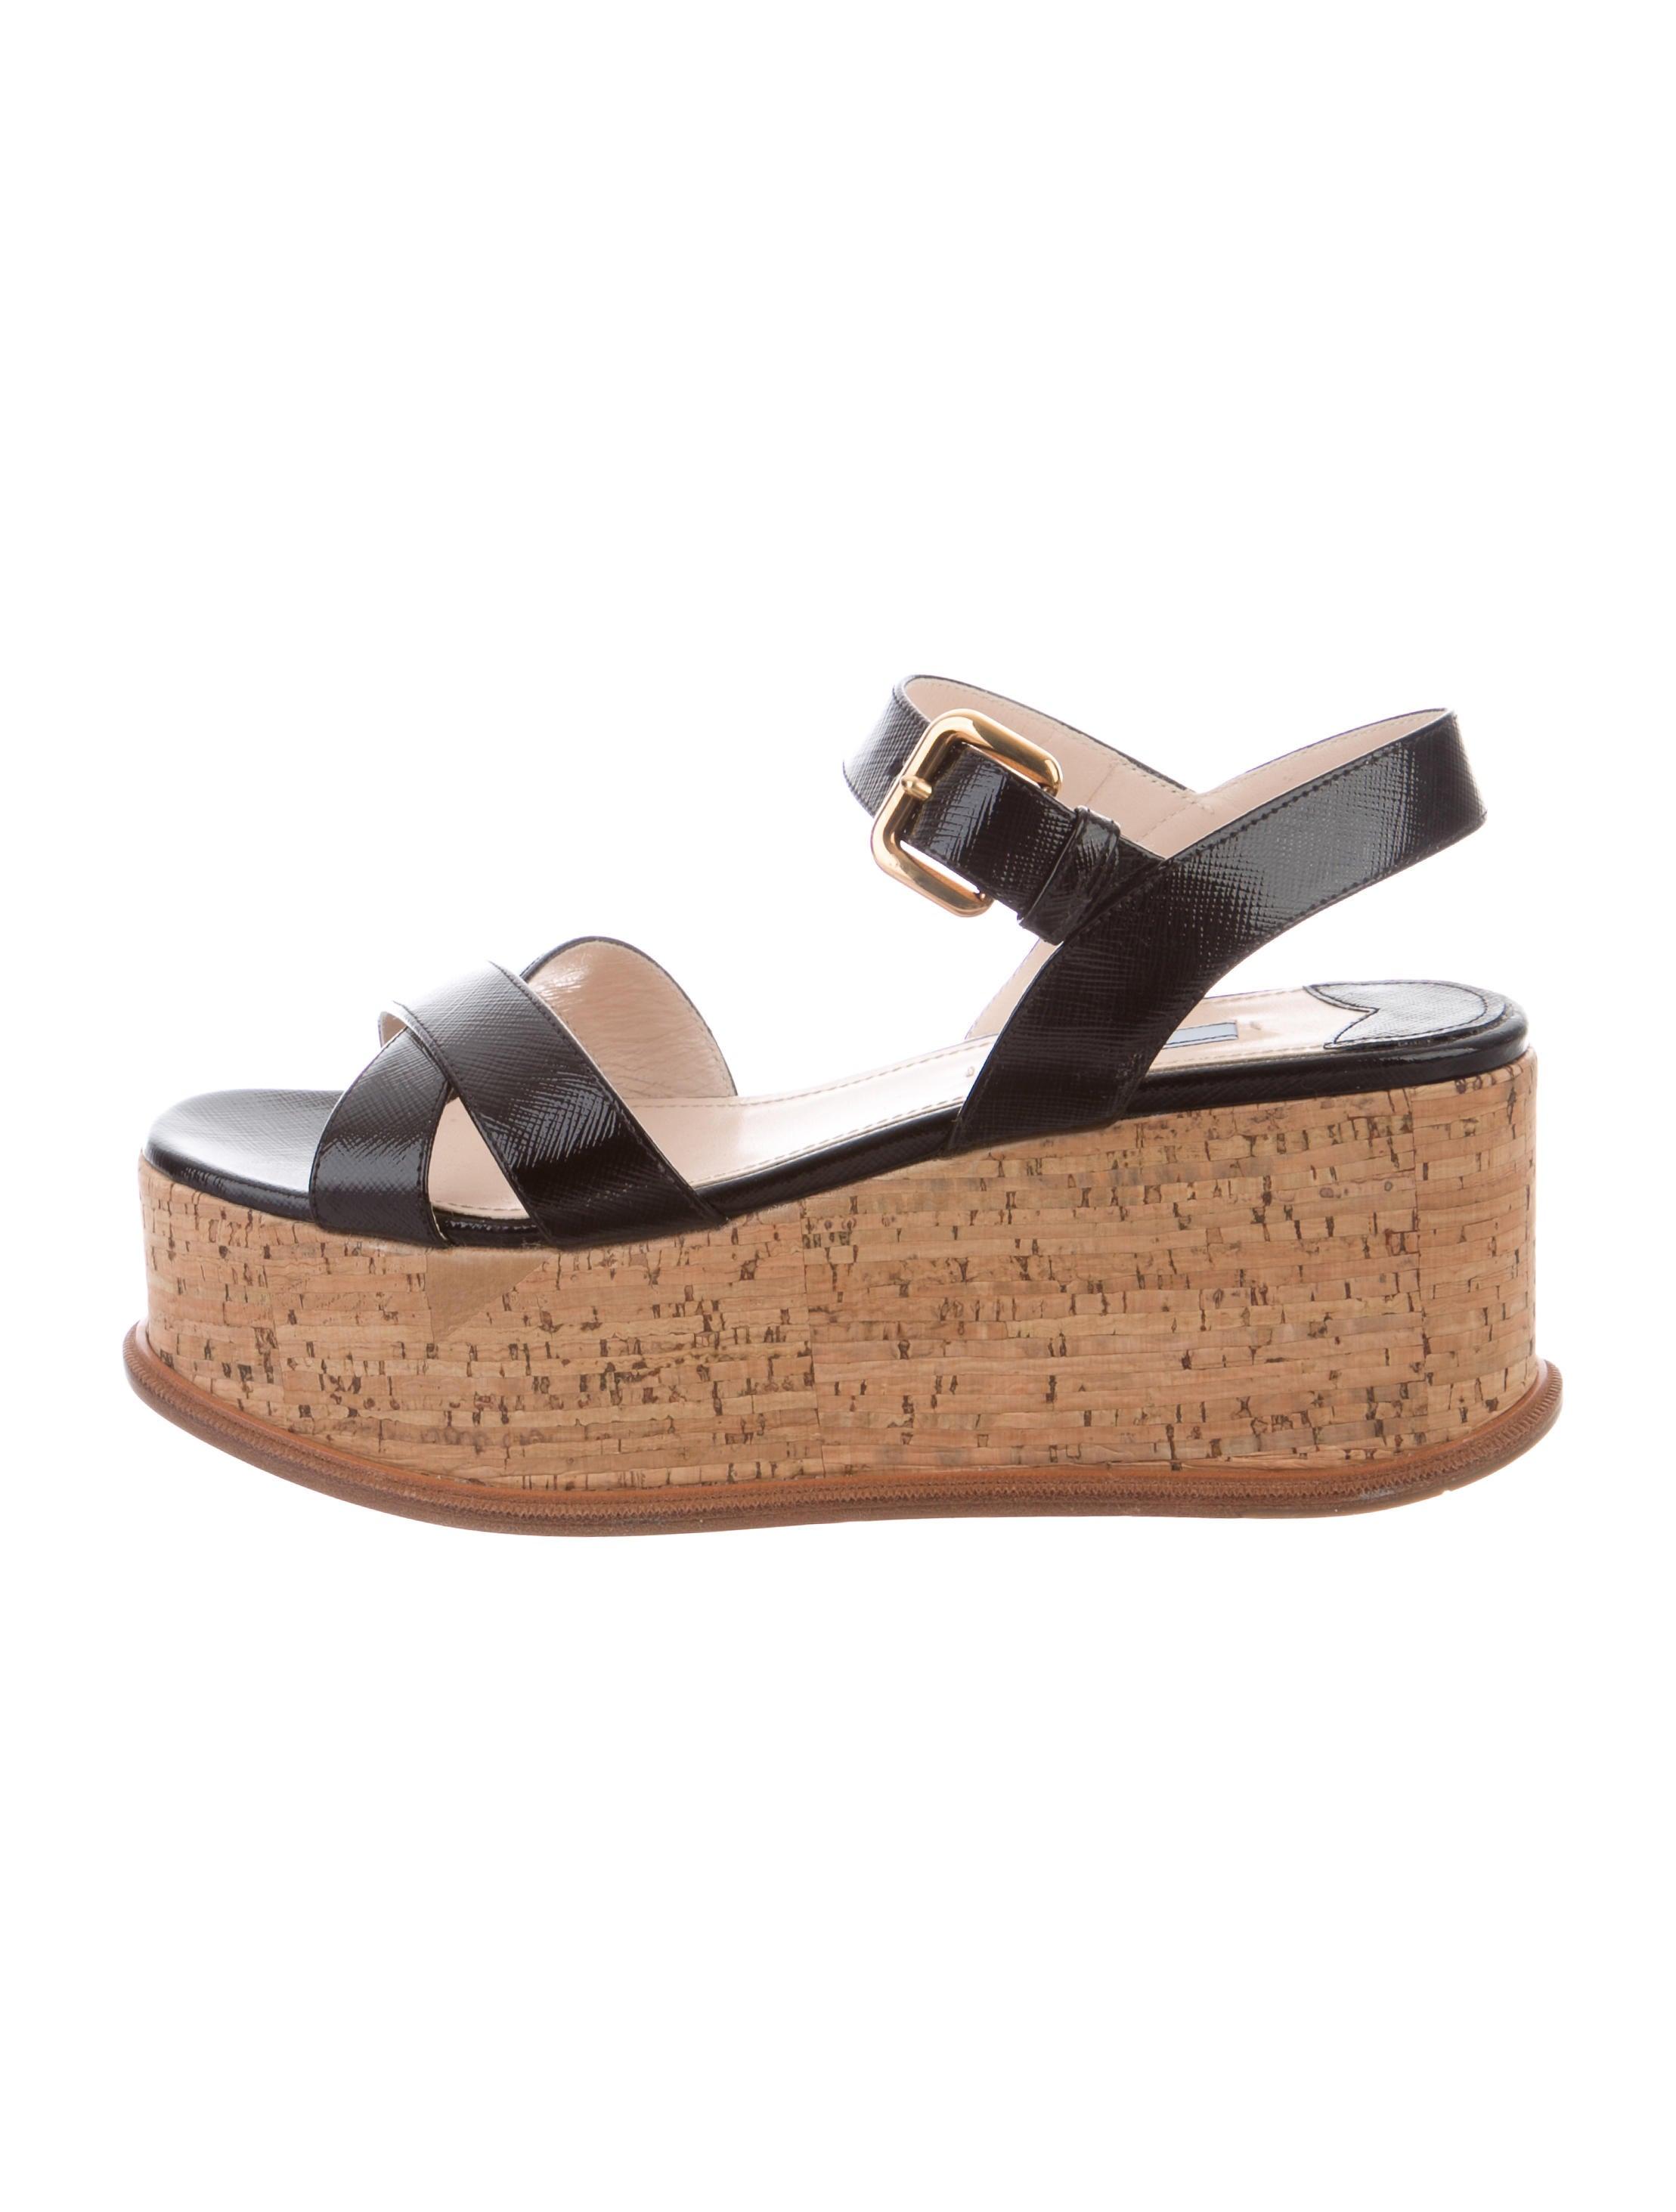 Prada Verice Wedge Sandals best sale amazon for sale cheap finishline X8zJ84